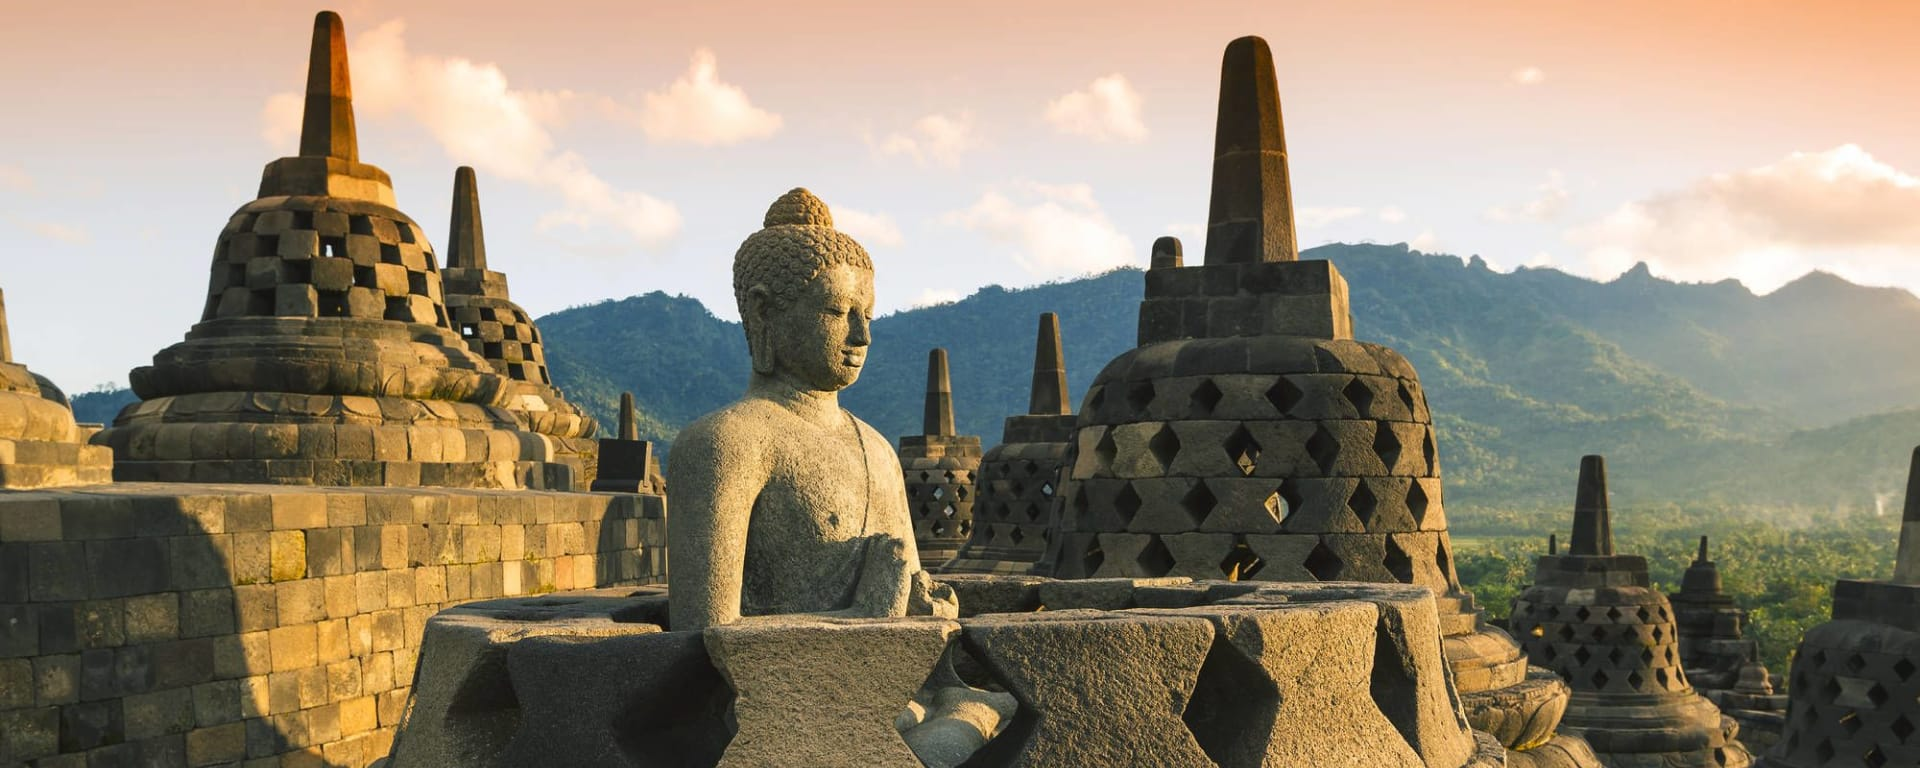 Java-Bali für Geniesser ab Yogyakarta: Yogyakarta Borobudur at Sunset